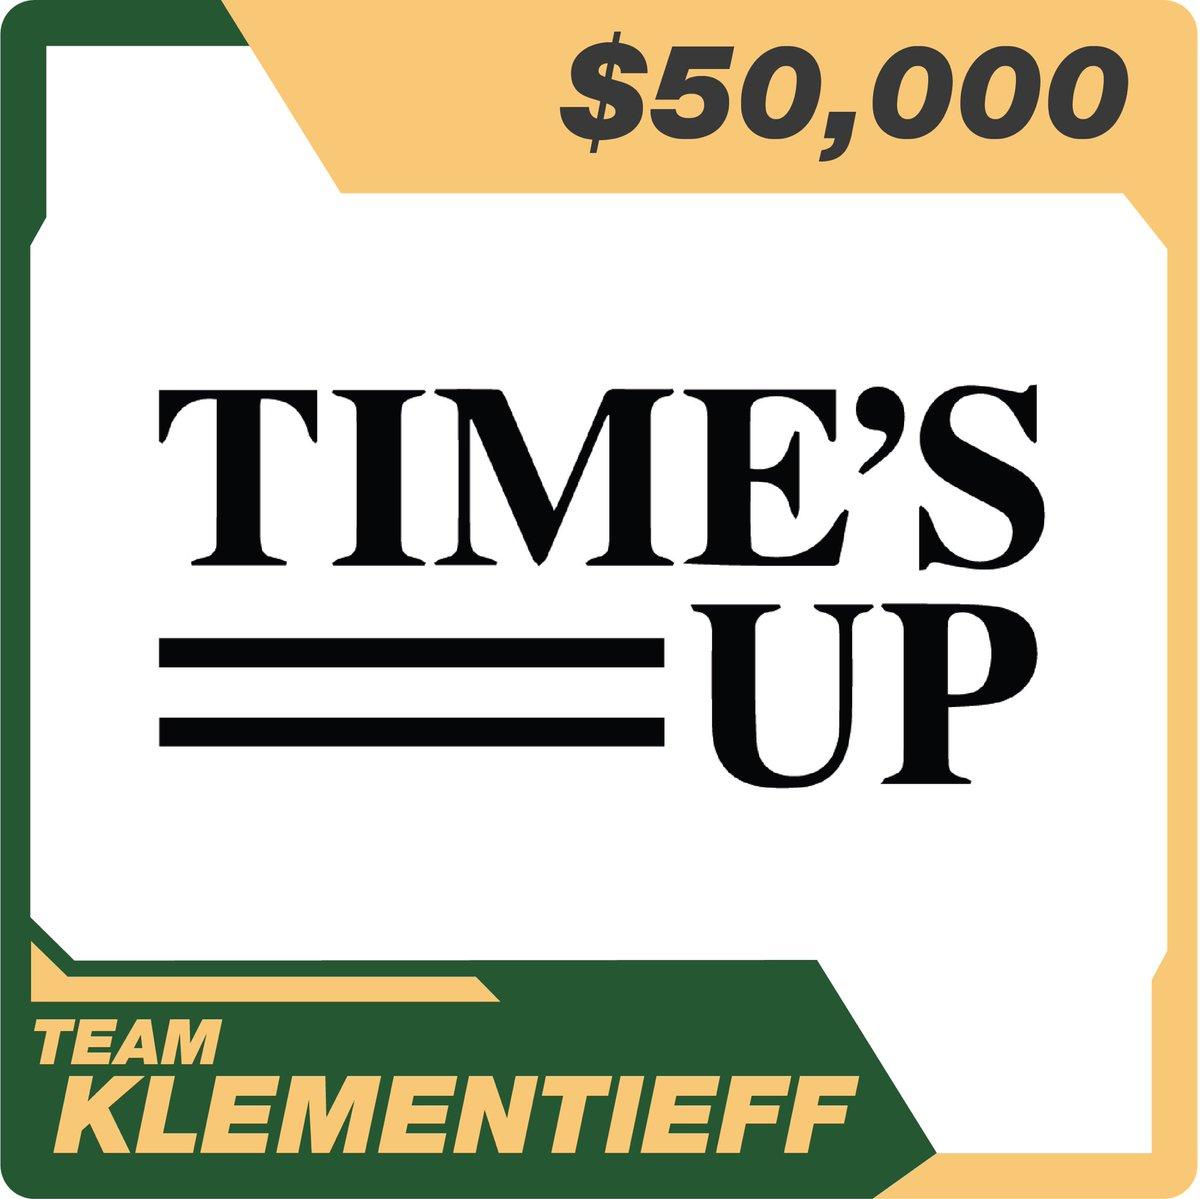 #TeamKlementieff @PomKlementieff @TIMESUPNOW